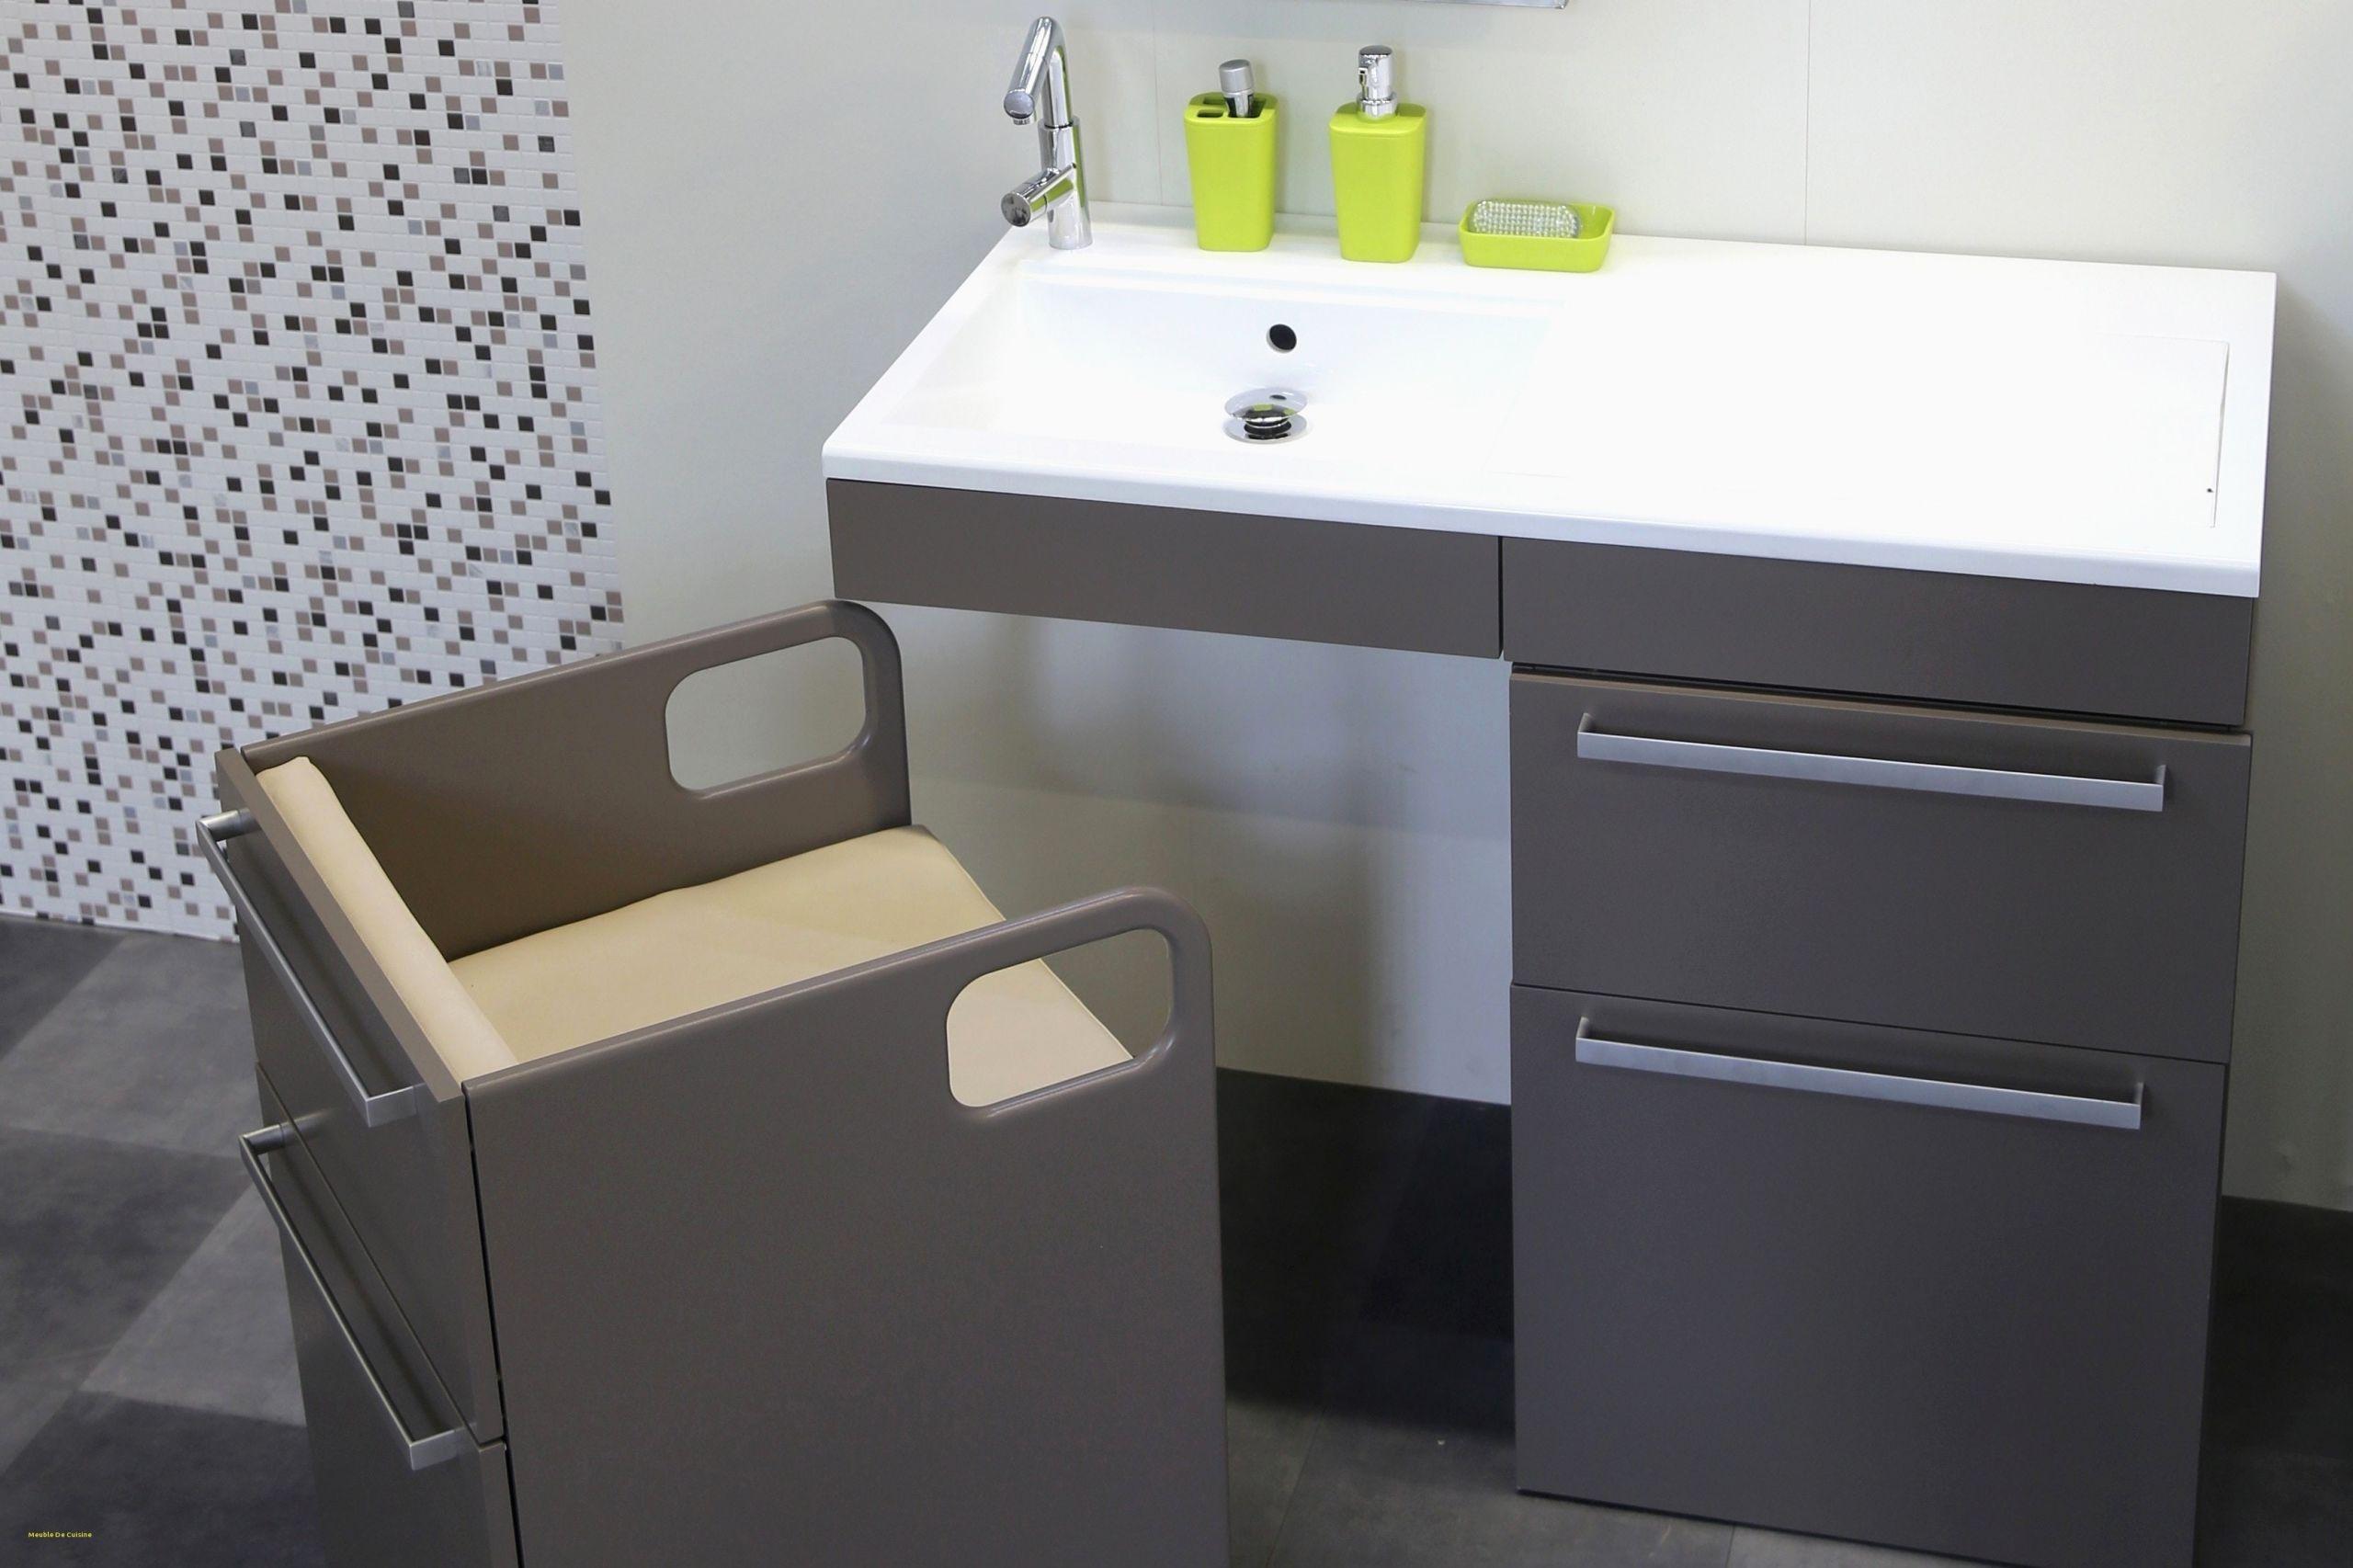 meuble vasque angle unique meuble lavabo d angle blanc sur bas od up espace aubade of meuble vasque angle